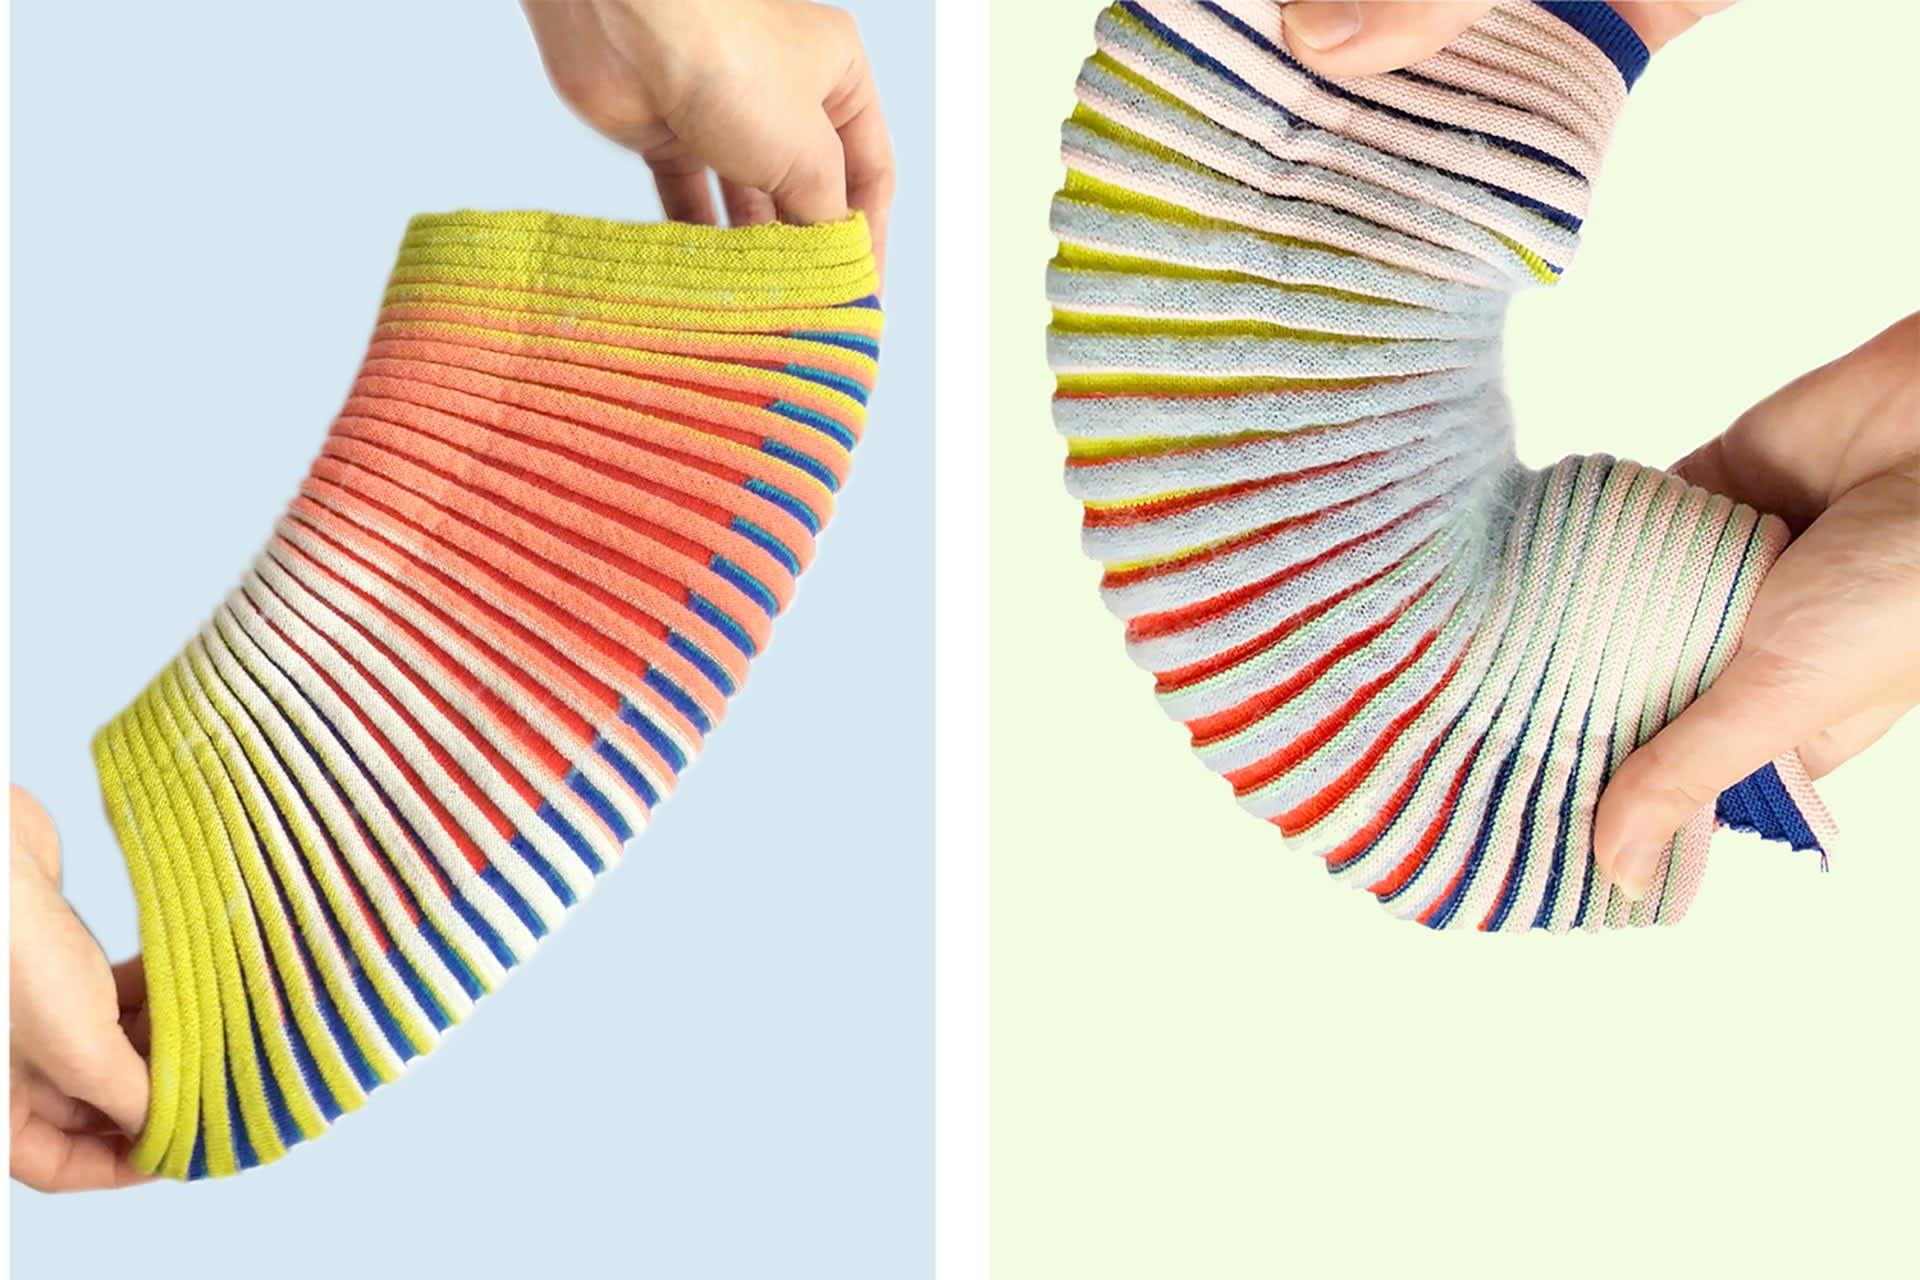 Shima Seiki Garter Stitch and Intarsia Knit Samples